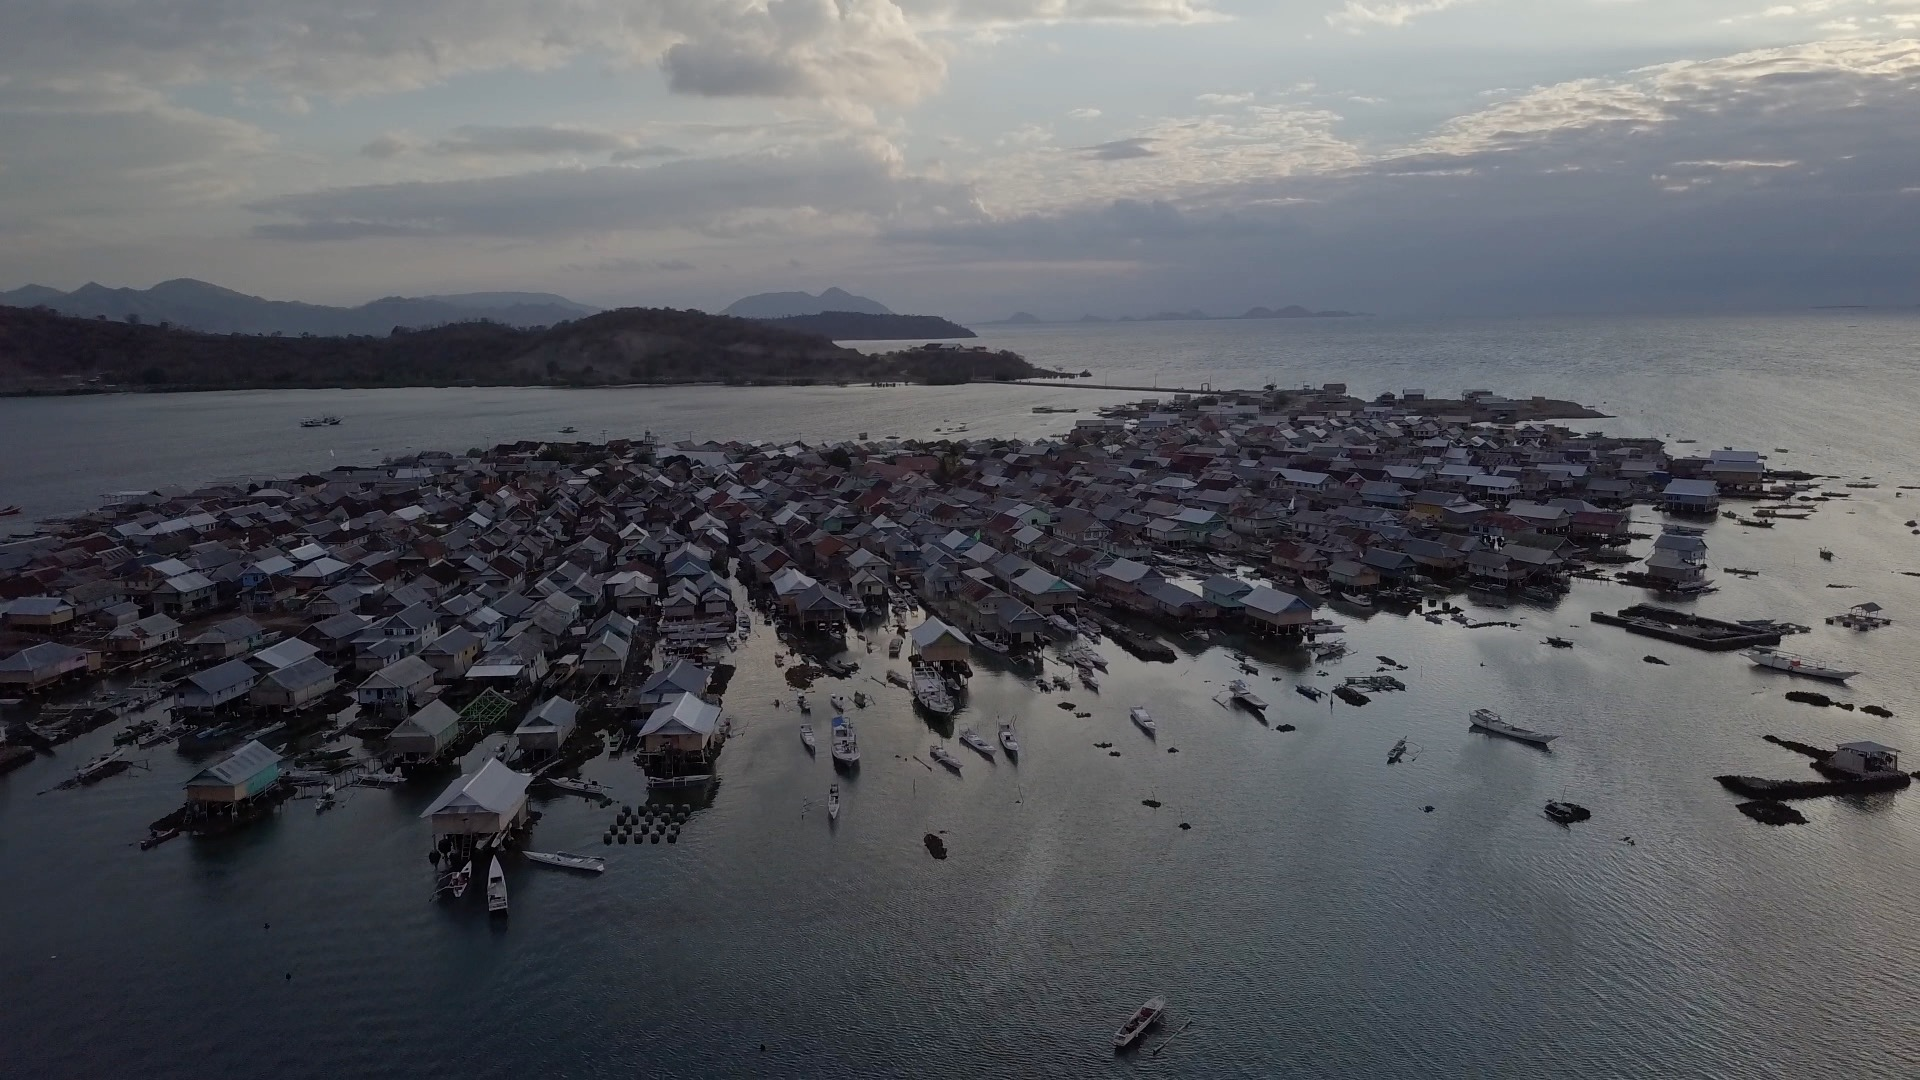 EBS 다큐프라임 - 인류세 3부 안드레의 바다